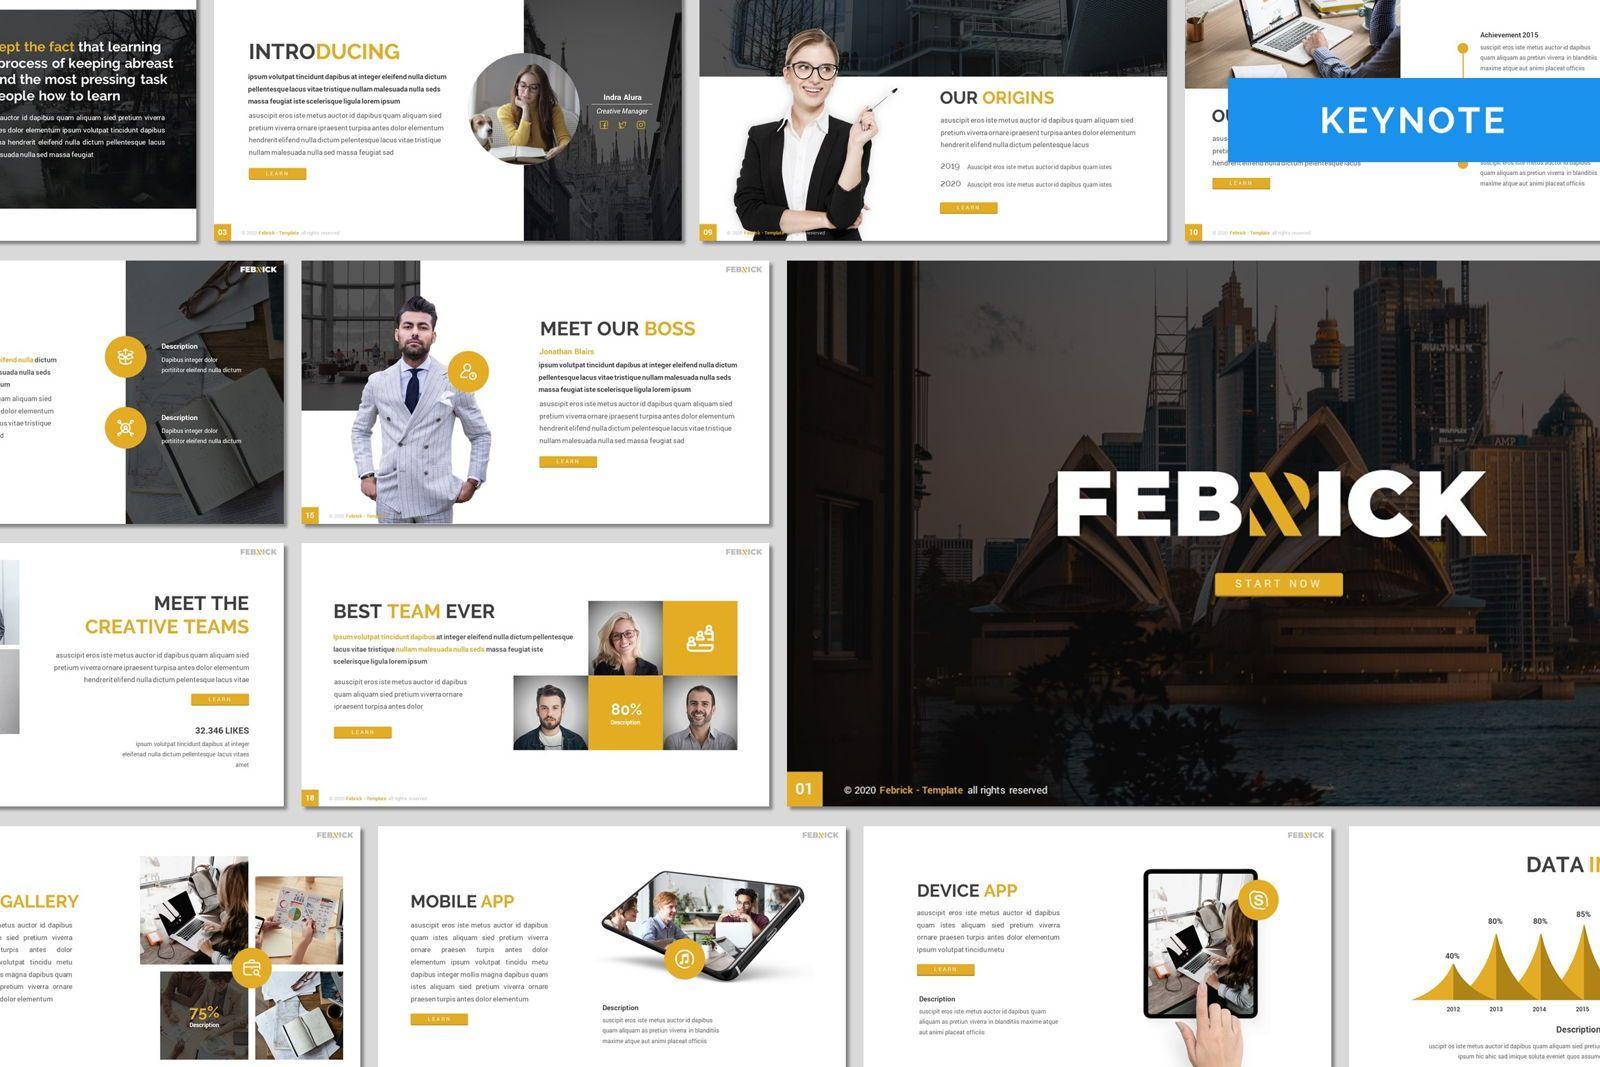 Febrick - Keynote Template, 08053, Presentation Templates — PoweredTemplate.com